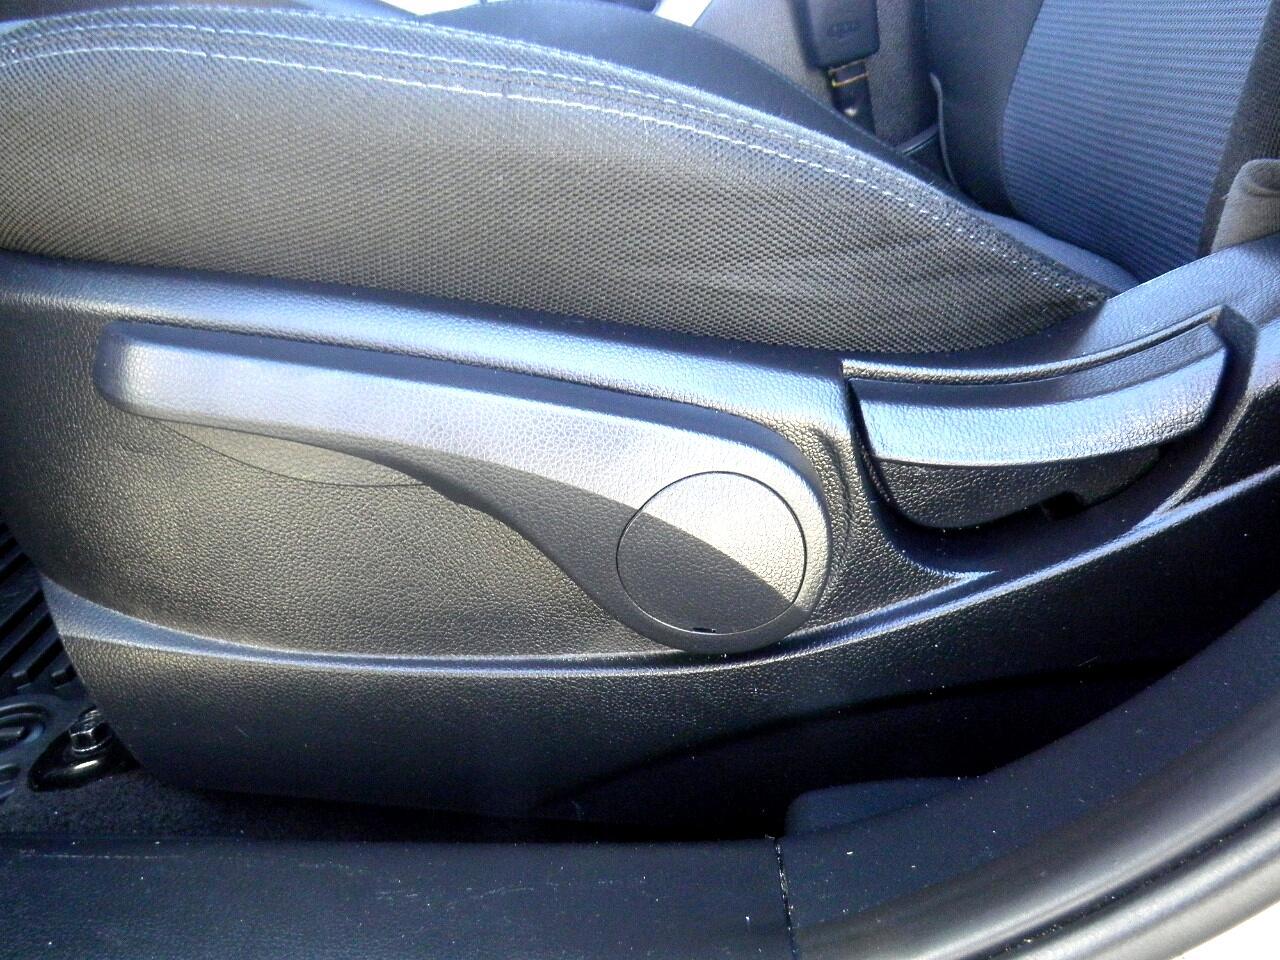 2016 Kia Sportage AWD 4dr LX